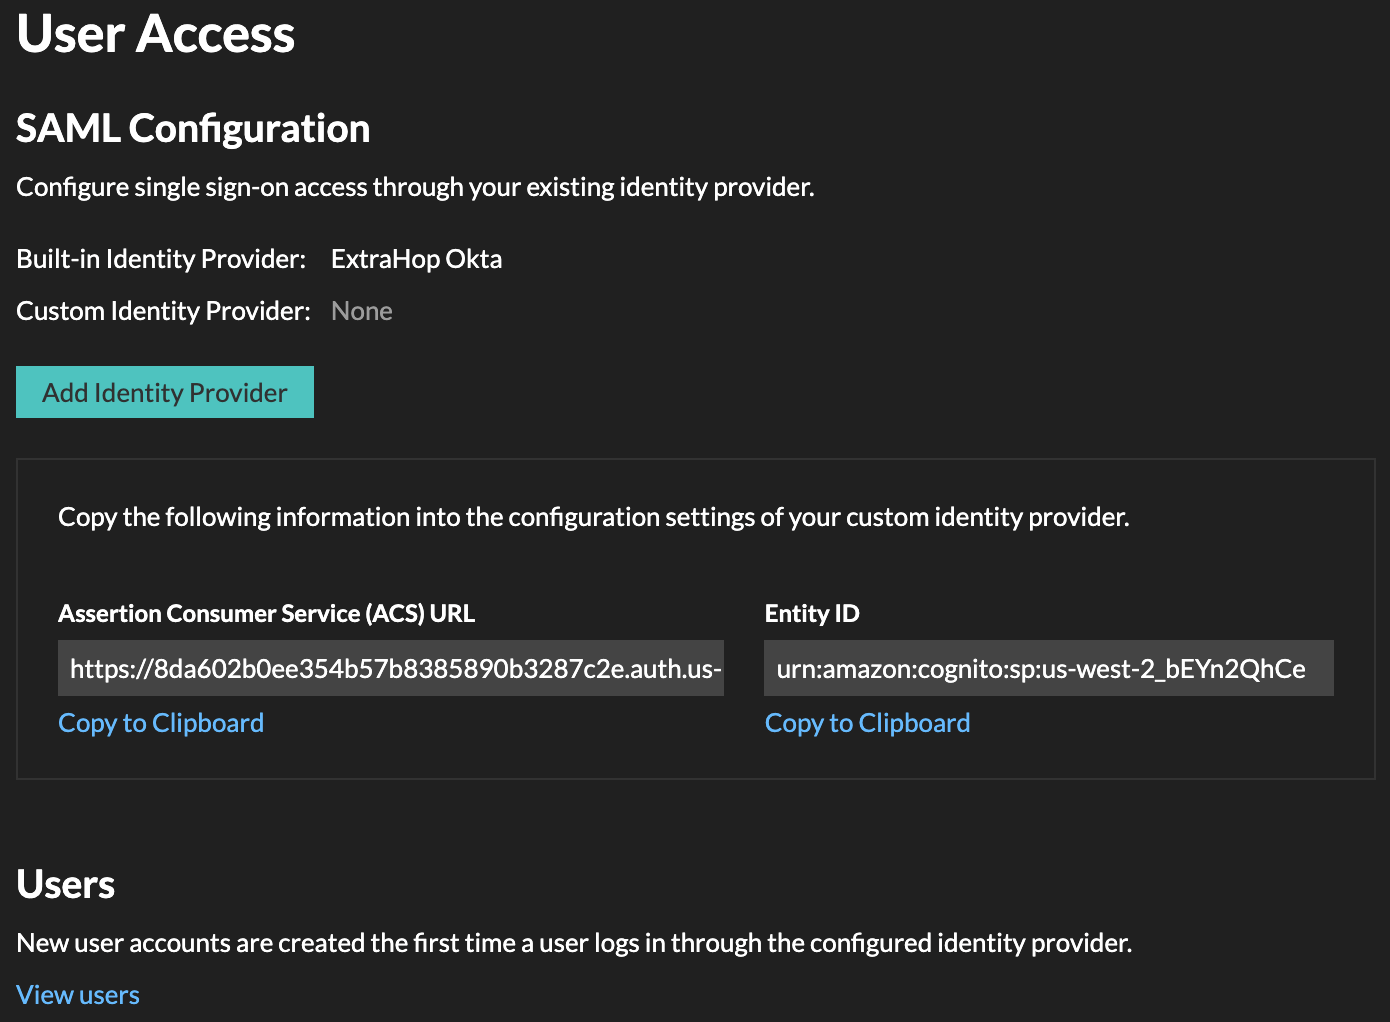 SAML identity configuration